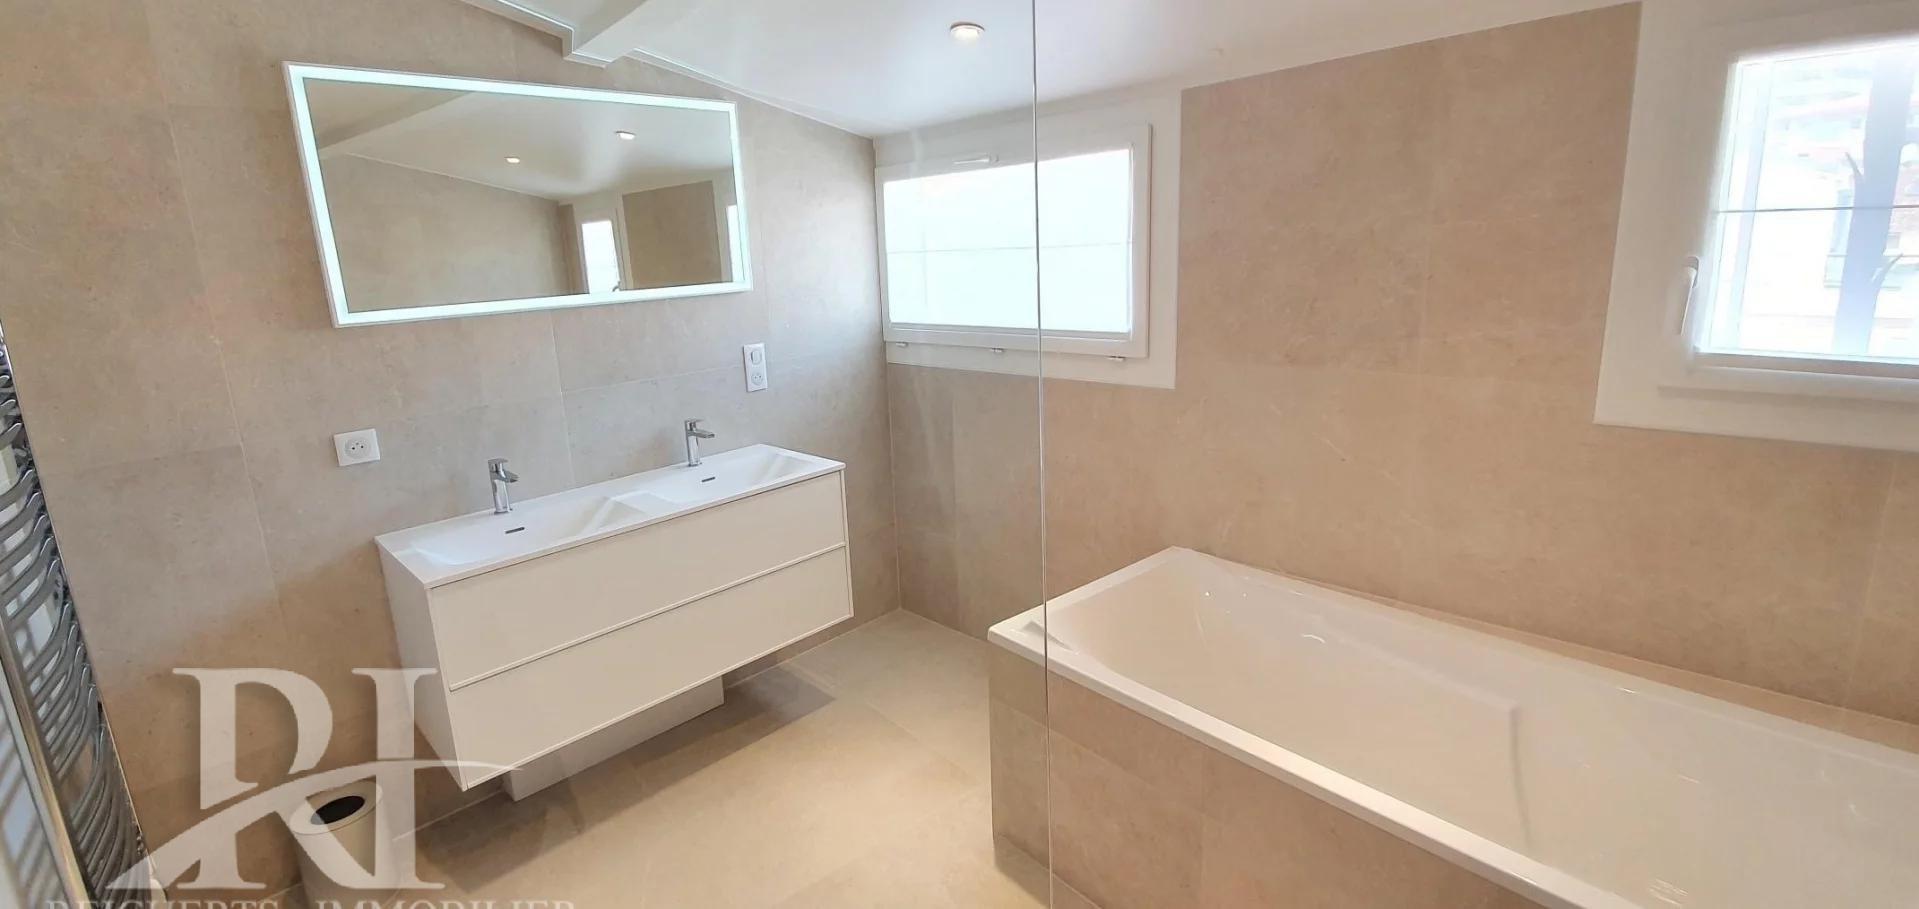 Rare : Cannes Downtown Seafront  3-BR duplex apartment